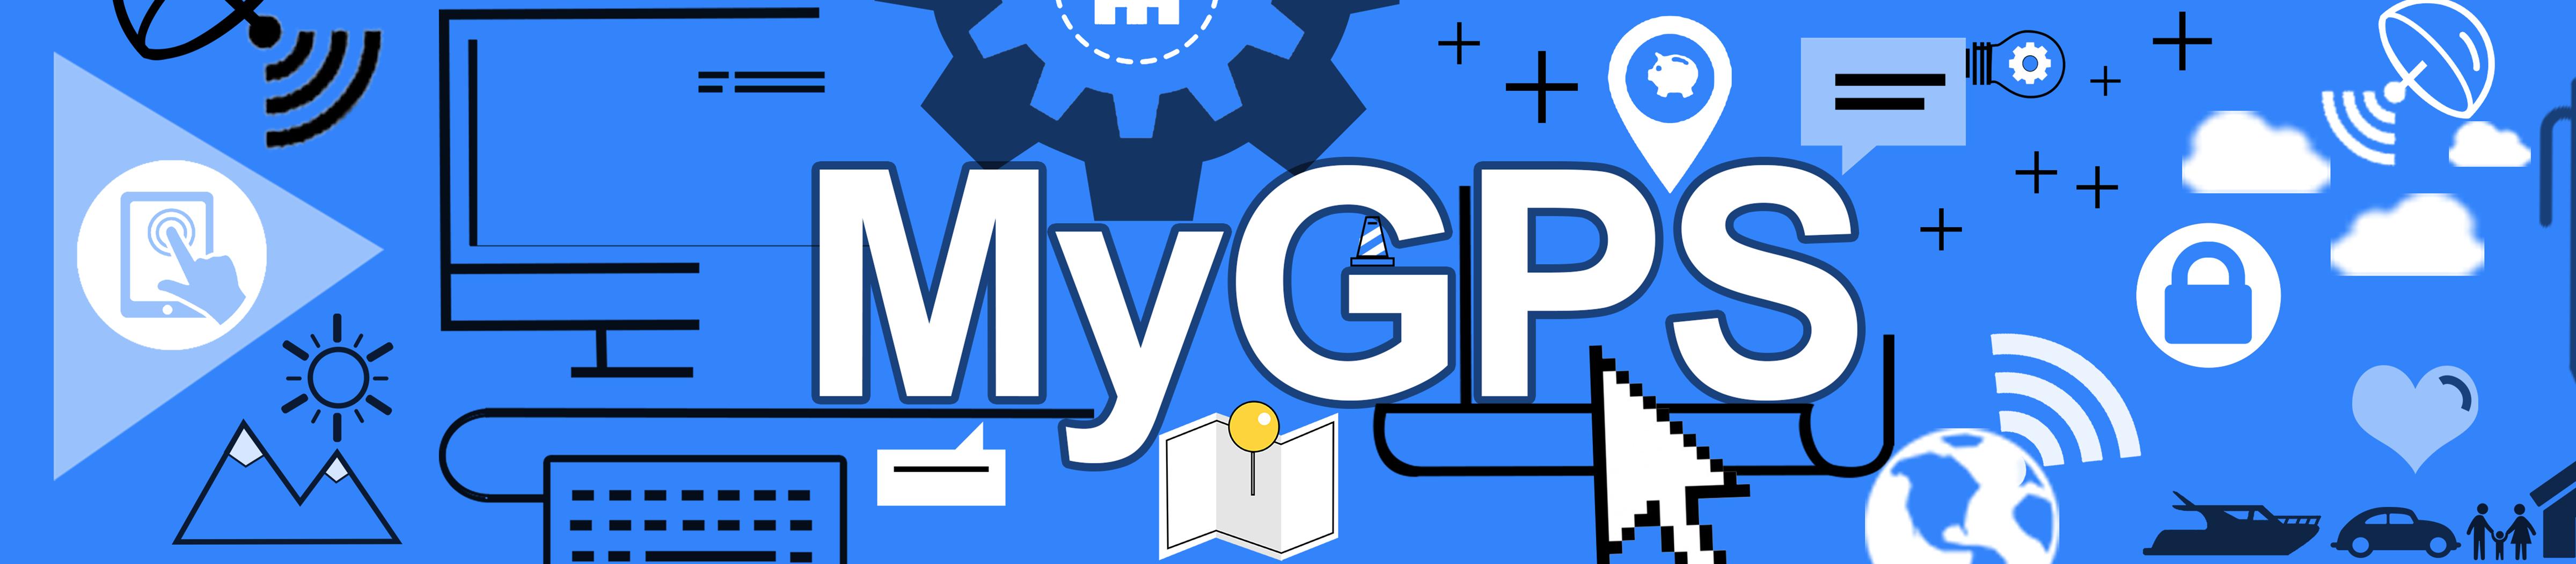 mygps-product-banner